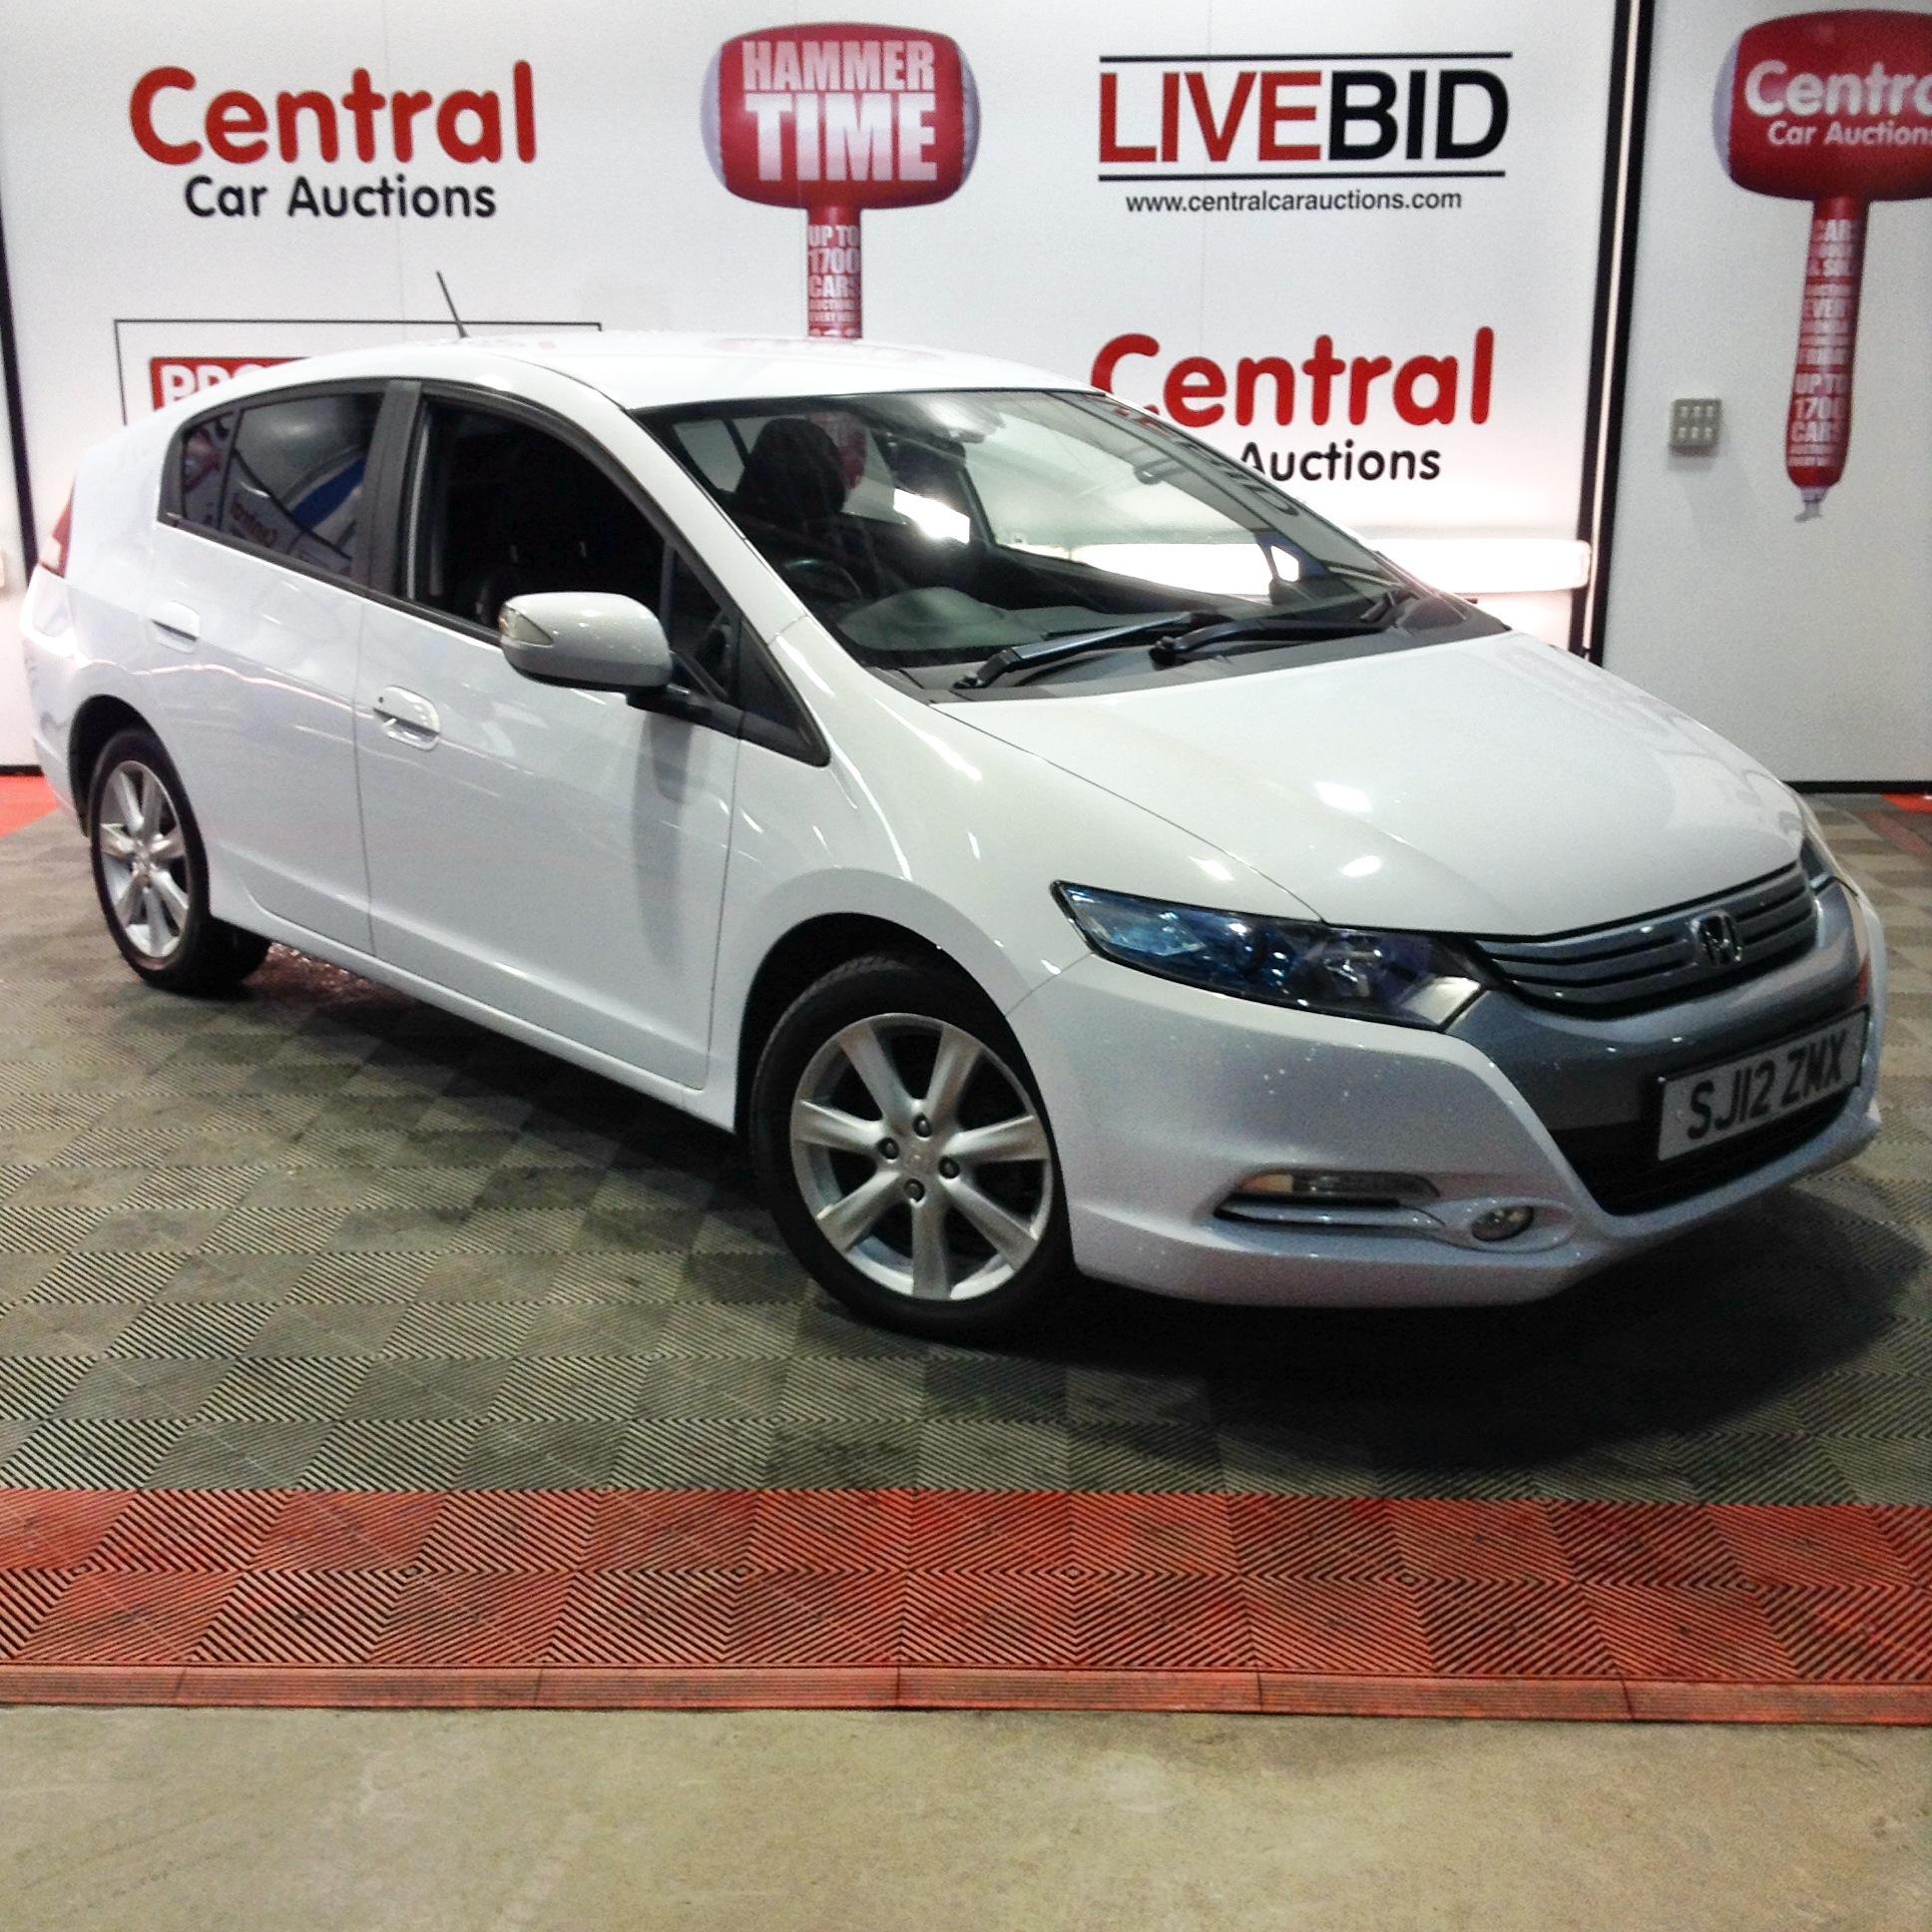 2012 Honda Insight Ex IMA Hybrid 1.4l • Central Car Auctions